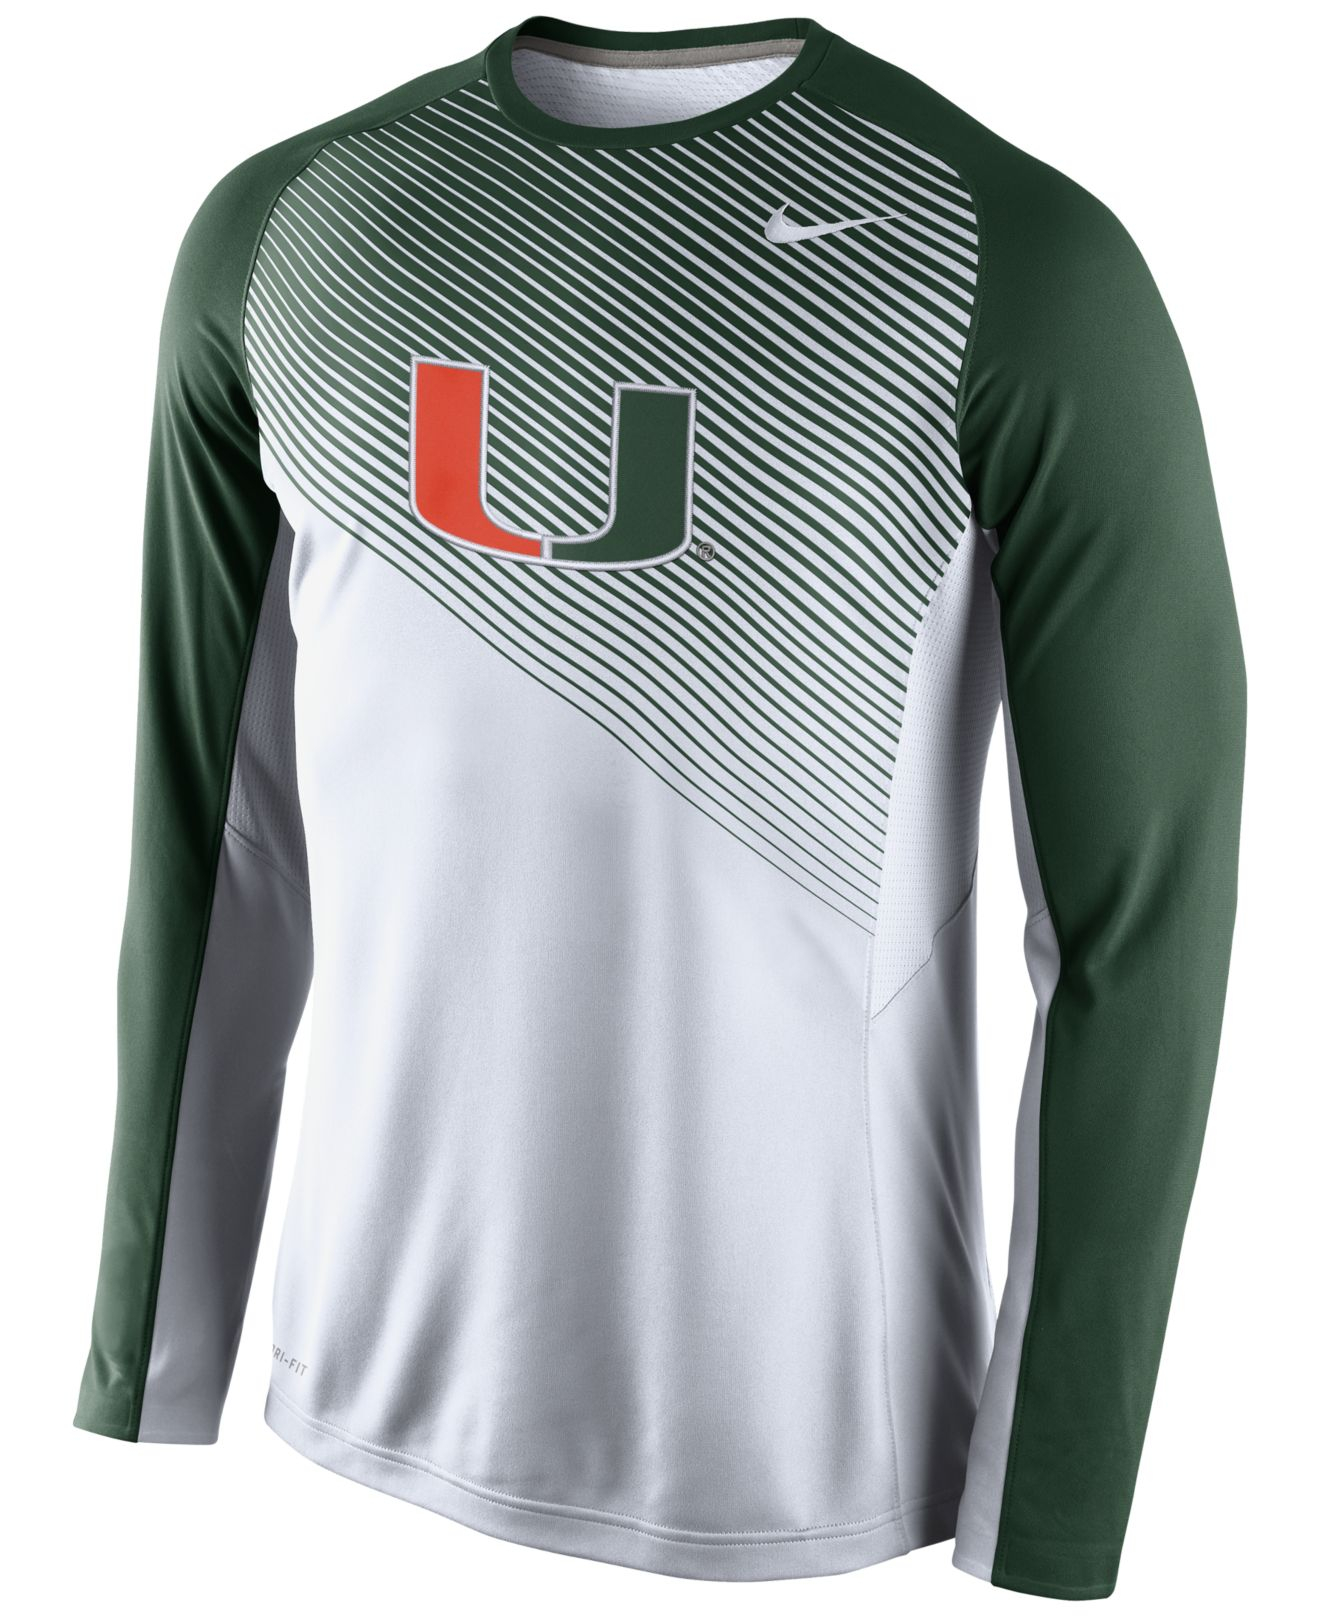 e117647bbbc Nike Mens Shootaround Dri Fit Long Sleeve Shirt ...